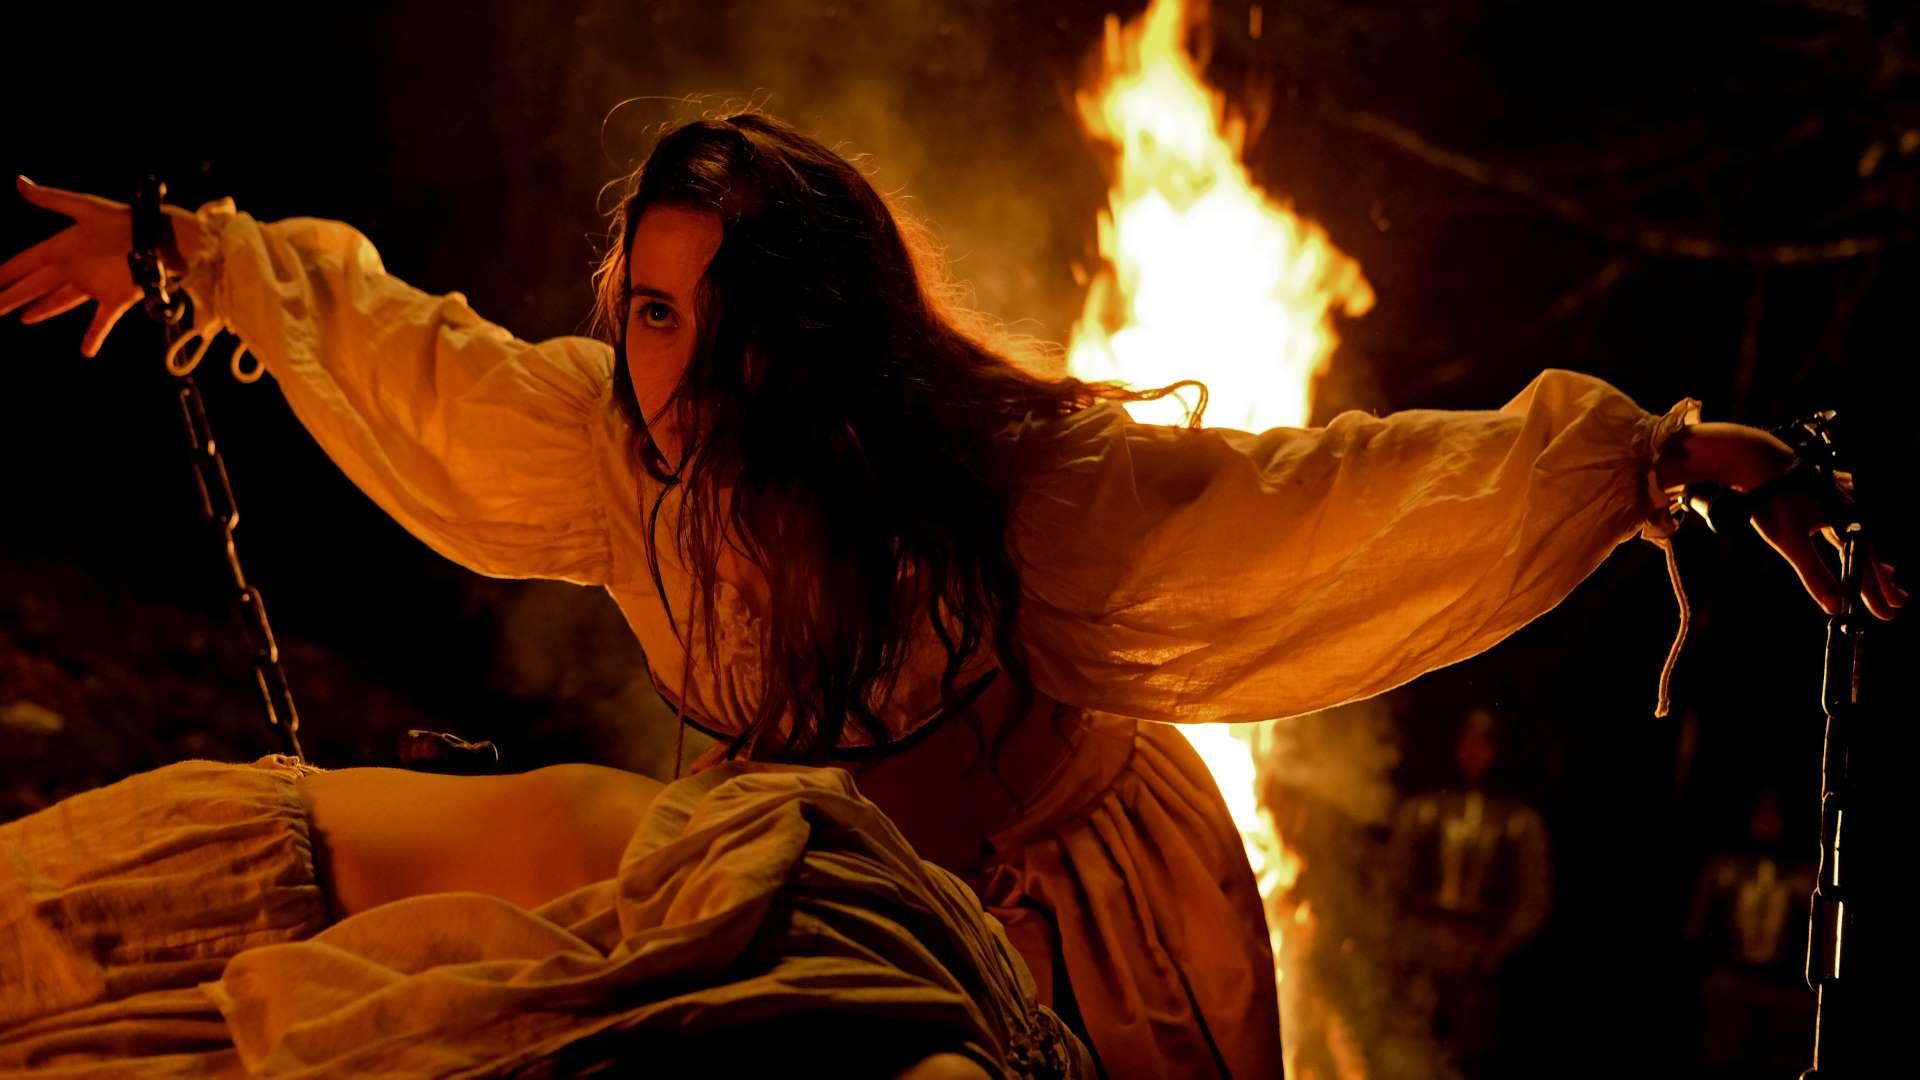 Escena de la película Akelarre de Pablo Agüero, protagonizada por Amaia Aberasturi.